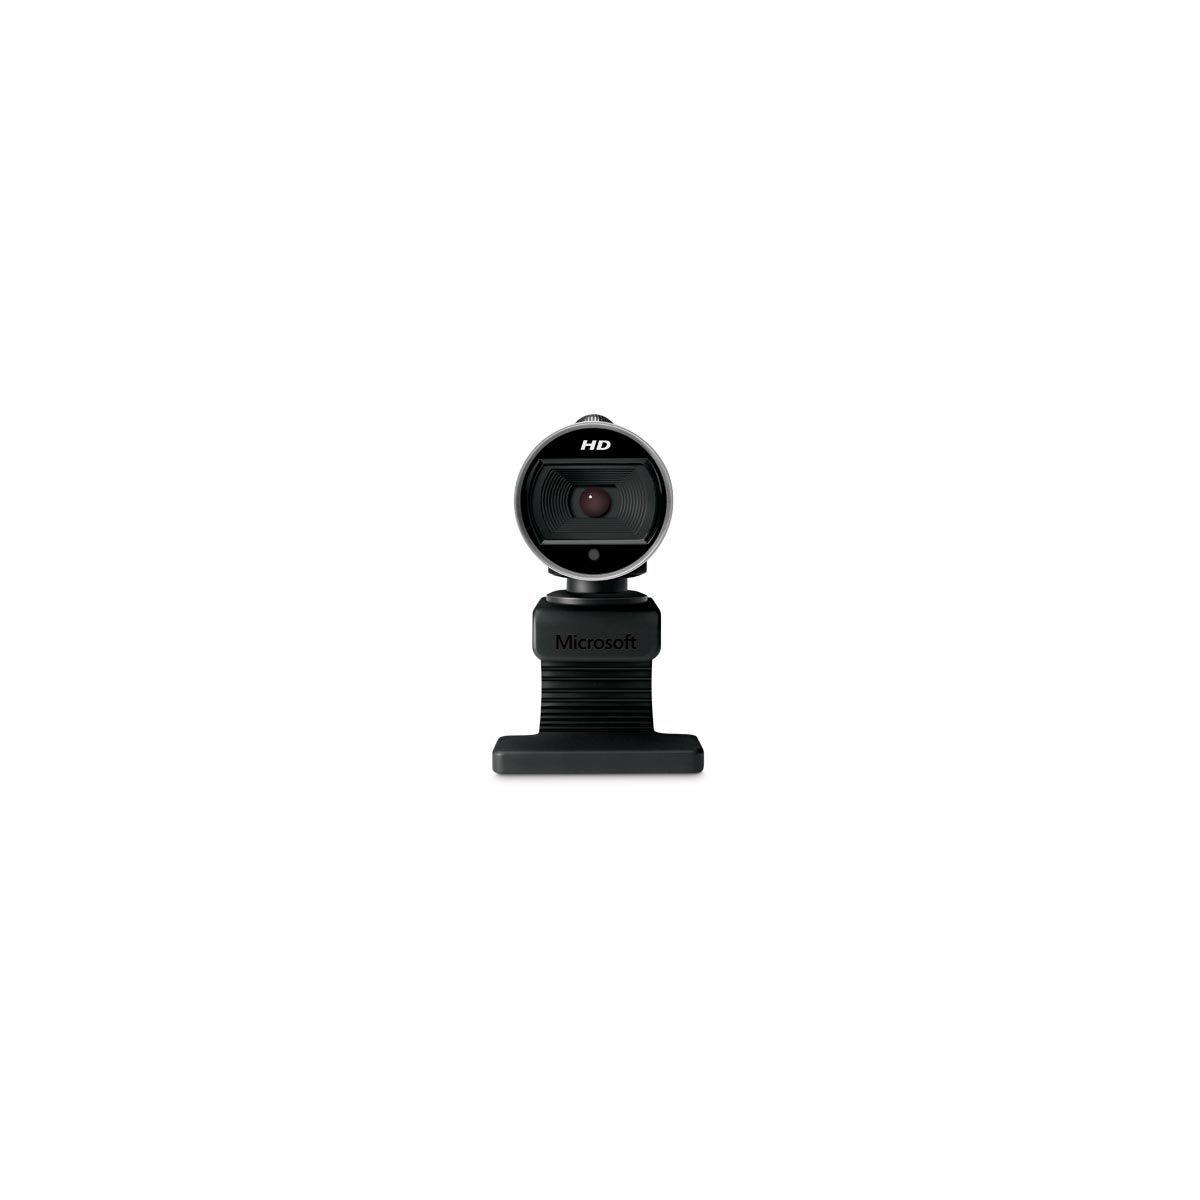 Webcam microsoft lifecam cinema - 3% de remise immédiate avec le code : multi3